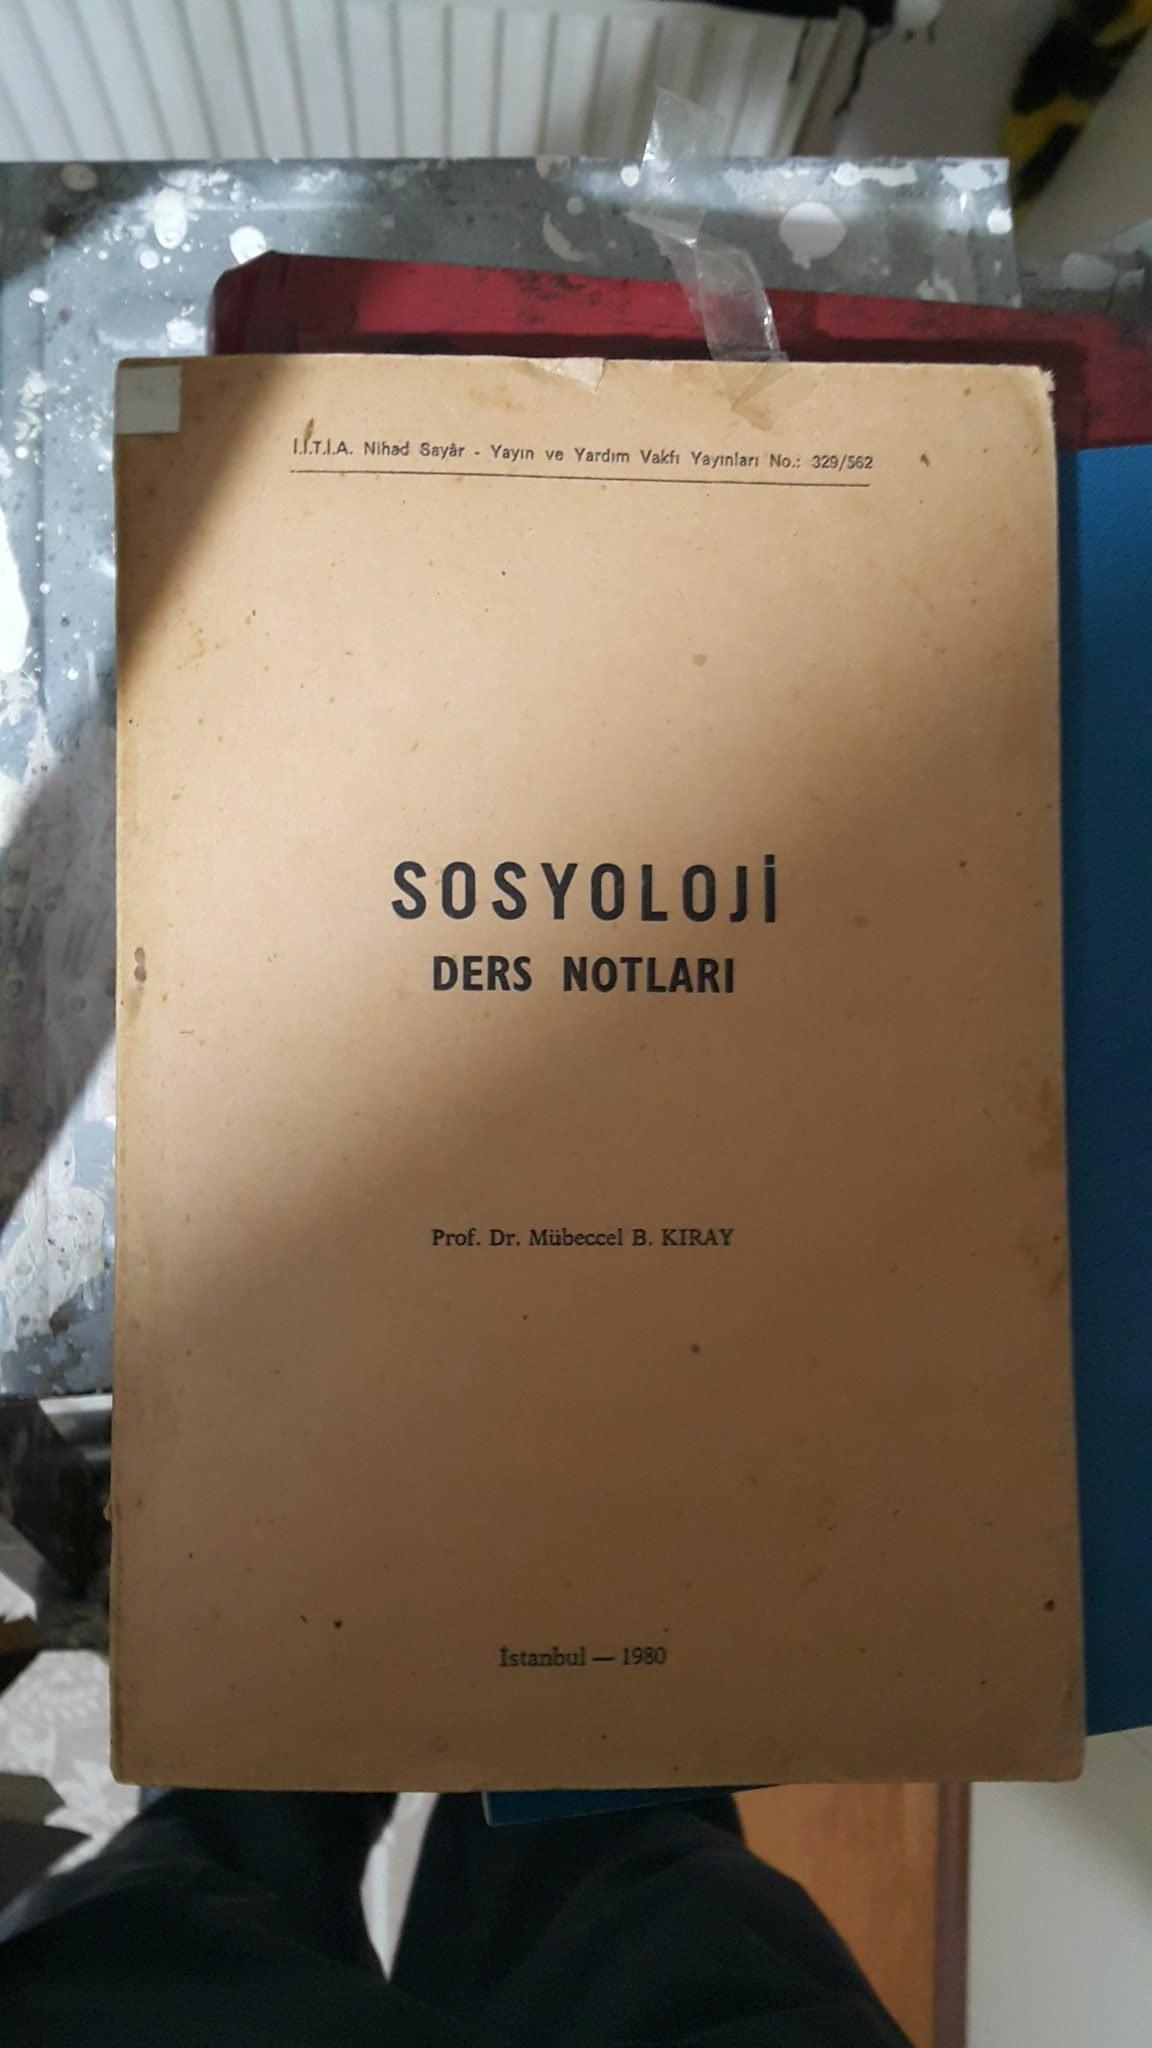 SOSYOLOJİ DERS NOTLARI/Mübeccel B.KIRAY